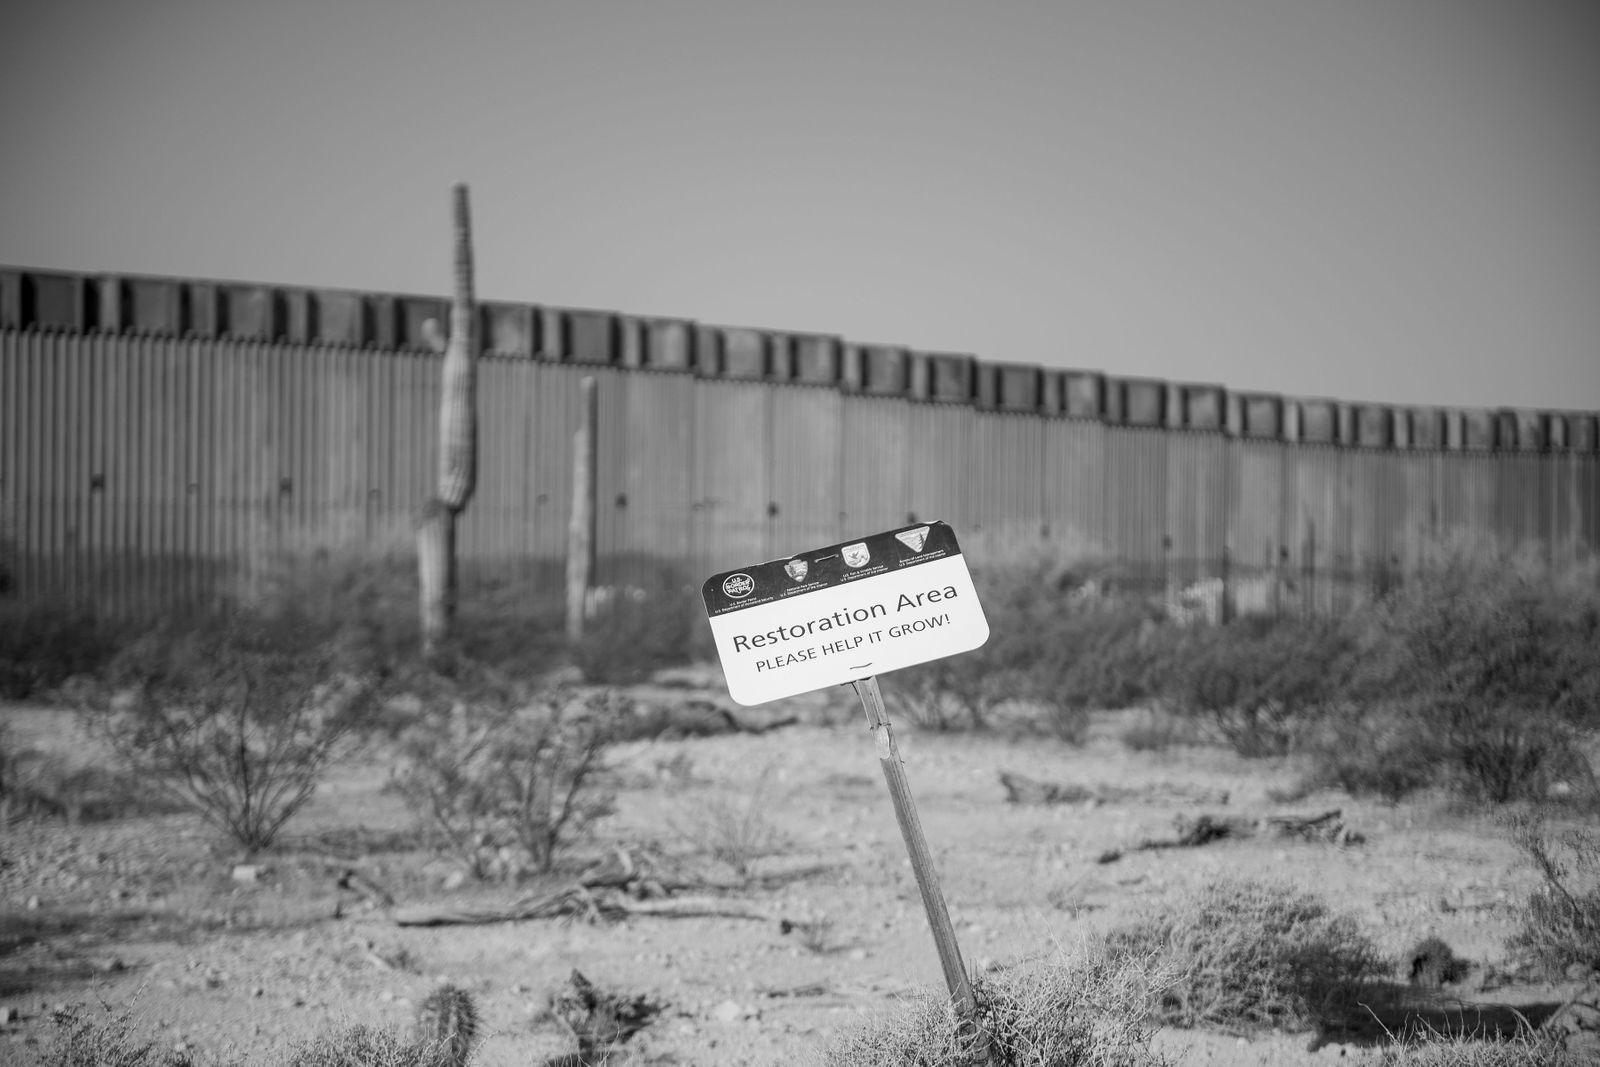 Border wall restoration area sign John Kurc